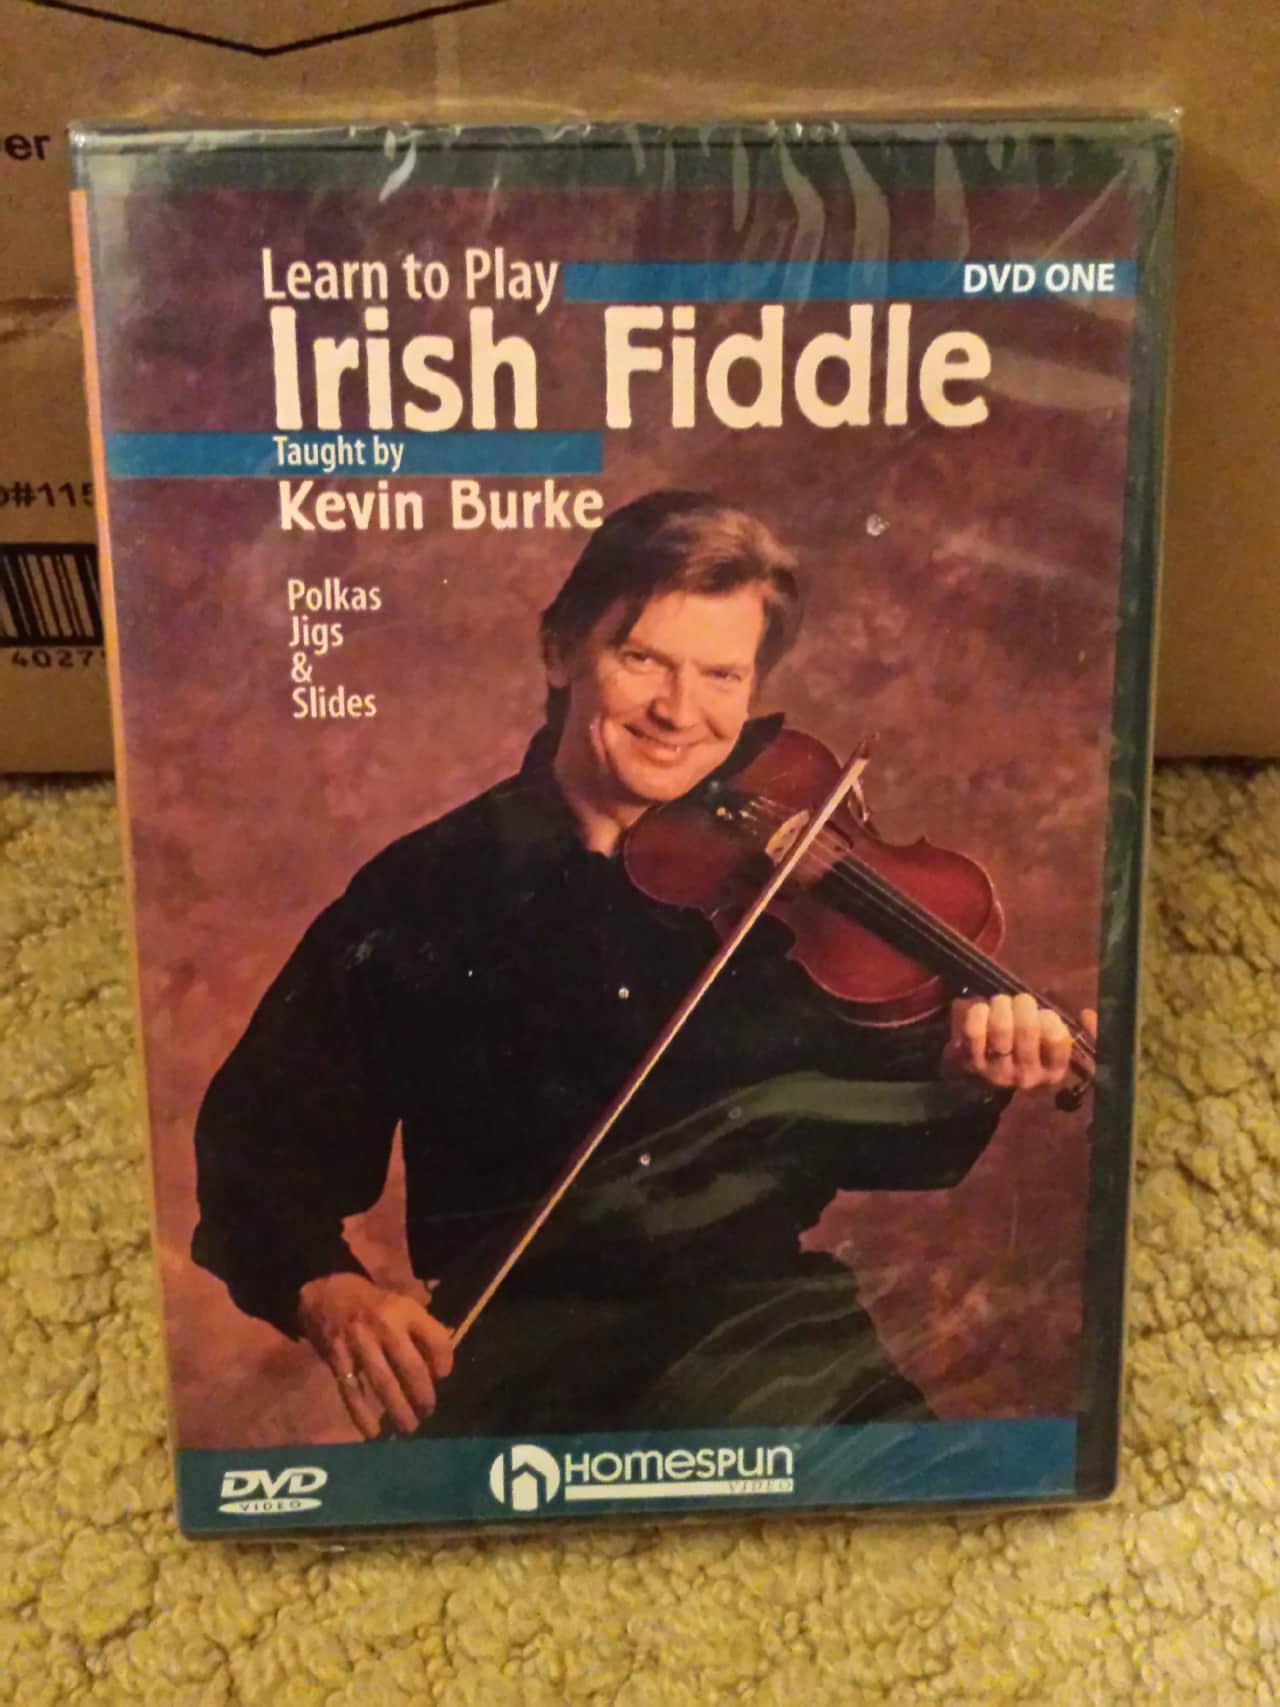 Amazon.com: Customer reviews: DVD-Learn To Play Irish ...